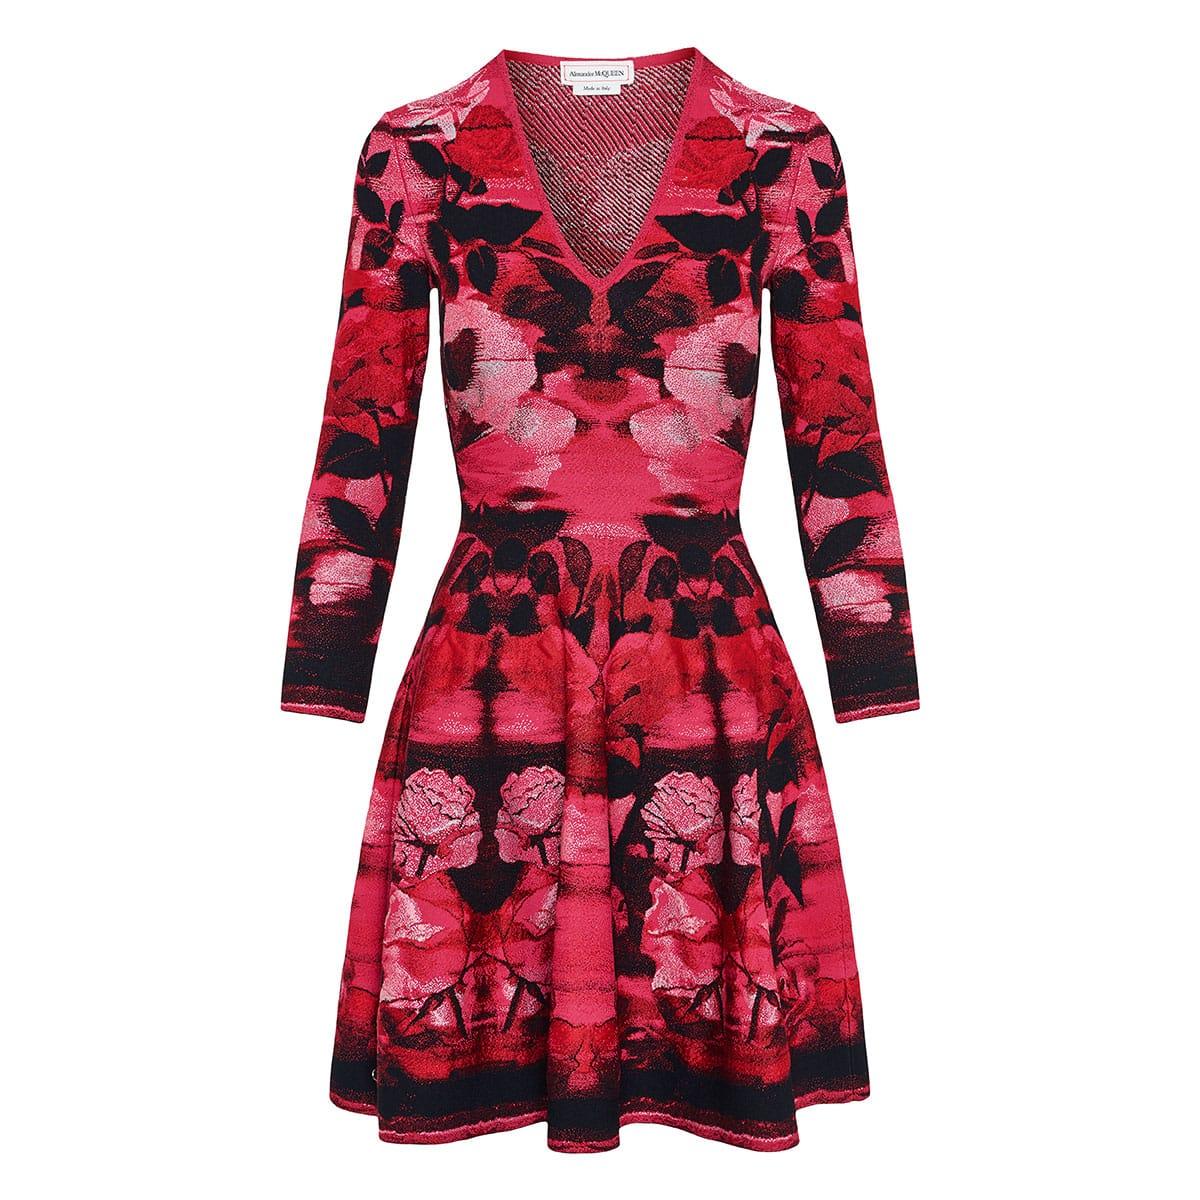 Floral jacquard-knit flared dress